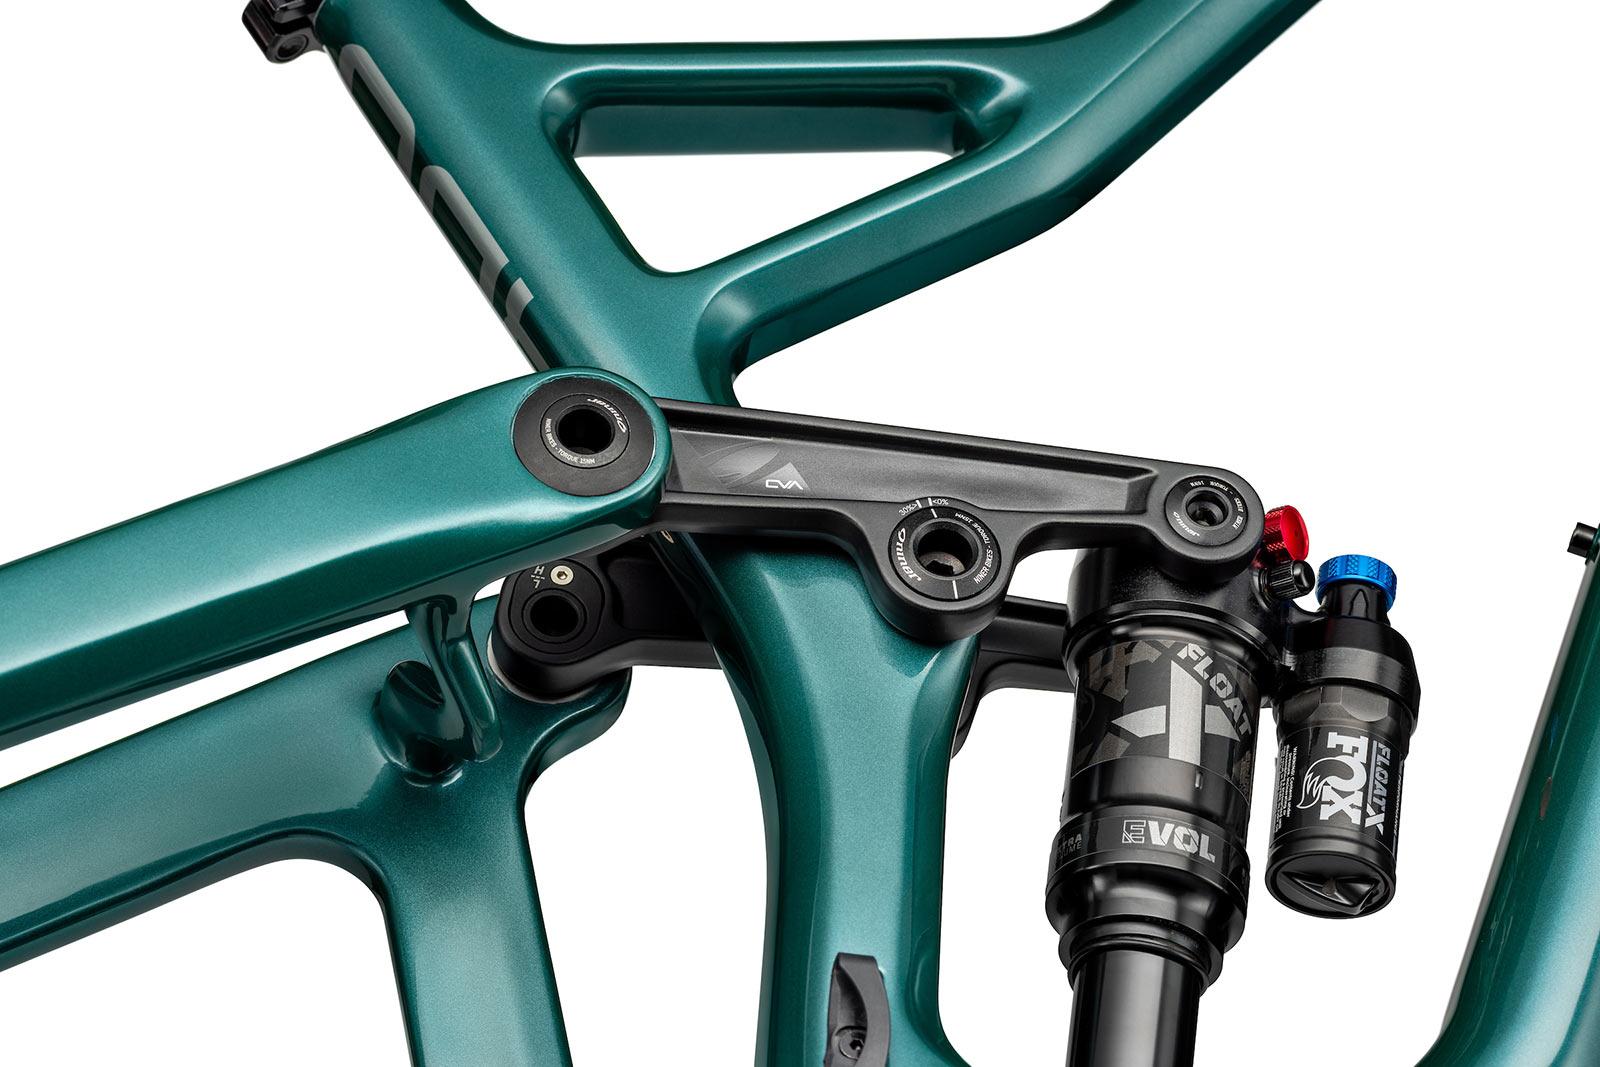 new niner jet 9 rdo trail mountain bike closeup shock linkage details